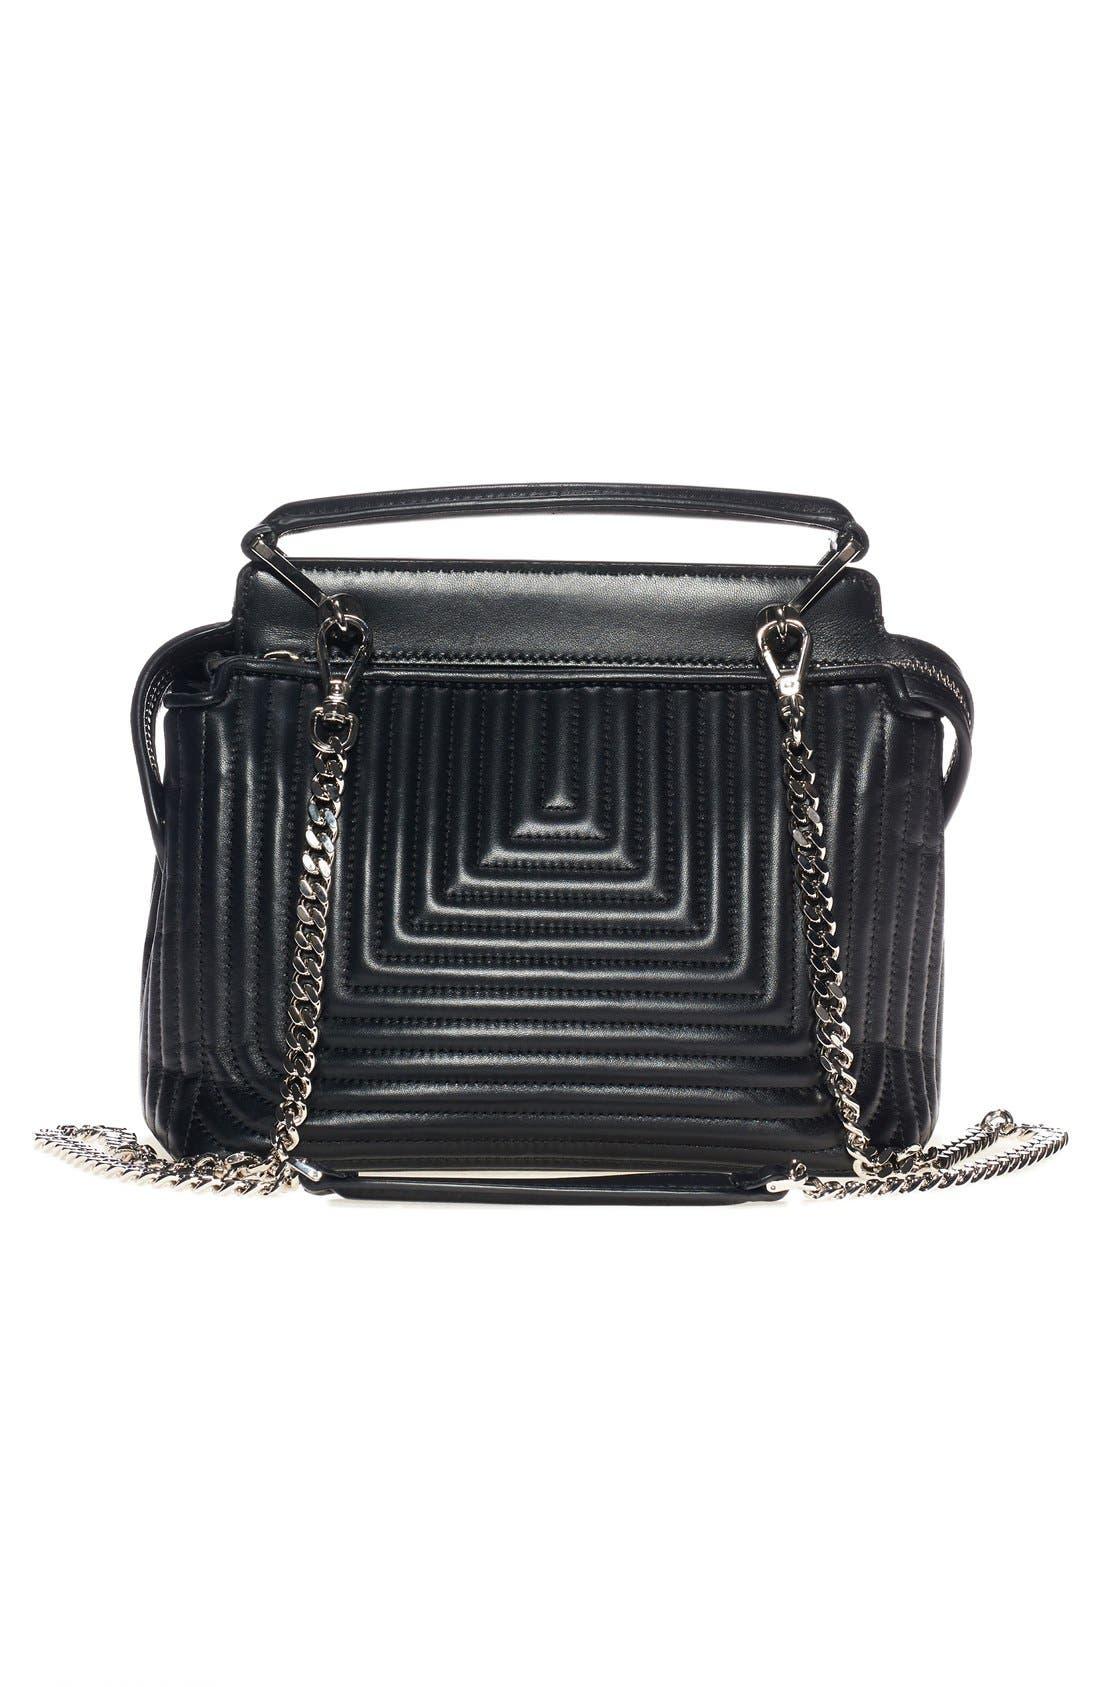 Alternate Image 3  - Fendi 'DOTCOM Click' Quilted Leather Satchel